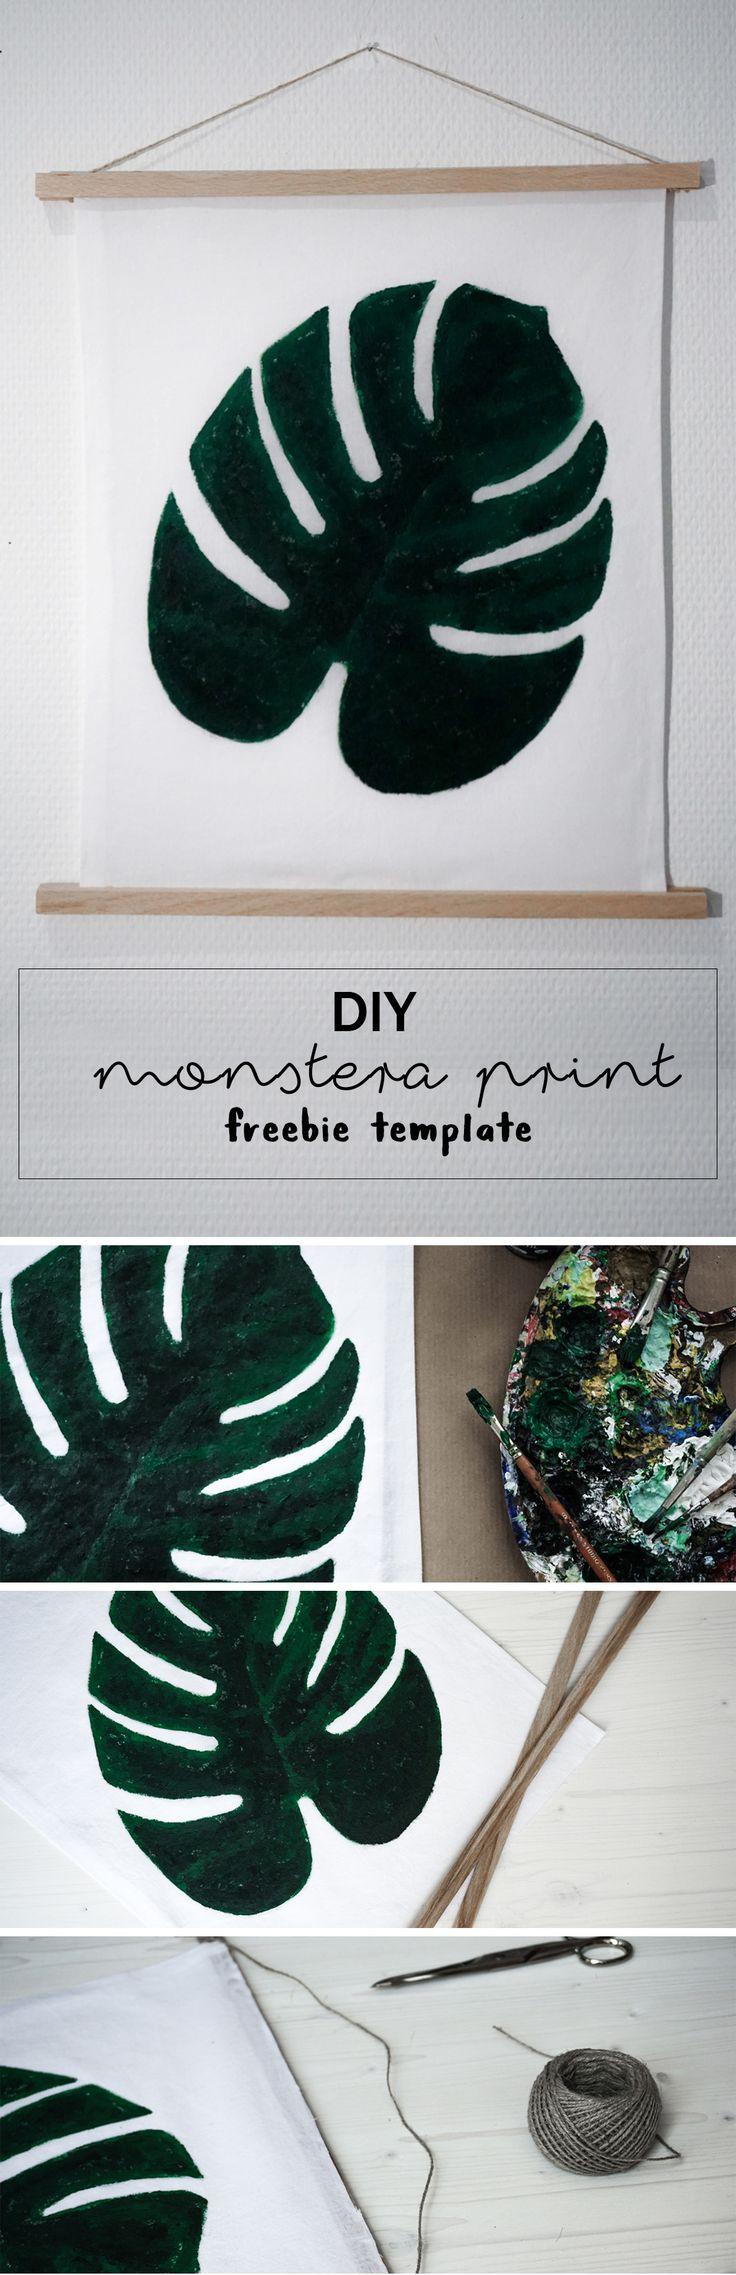 59 best DIY Monstera & Co images on Pinterest | Bricolage, Creative ...